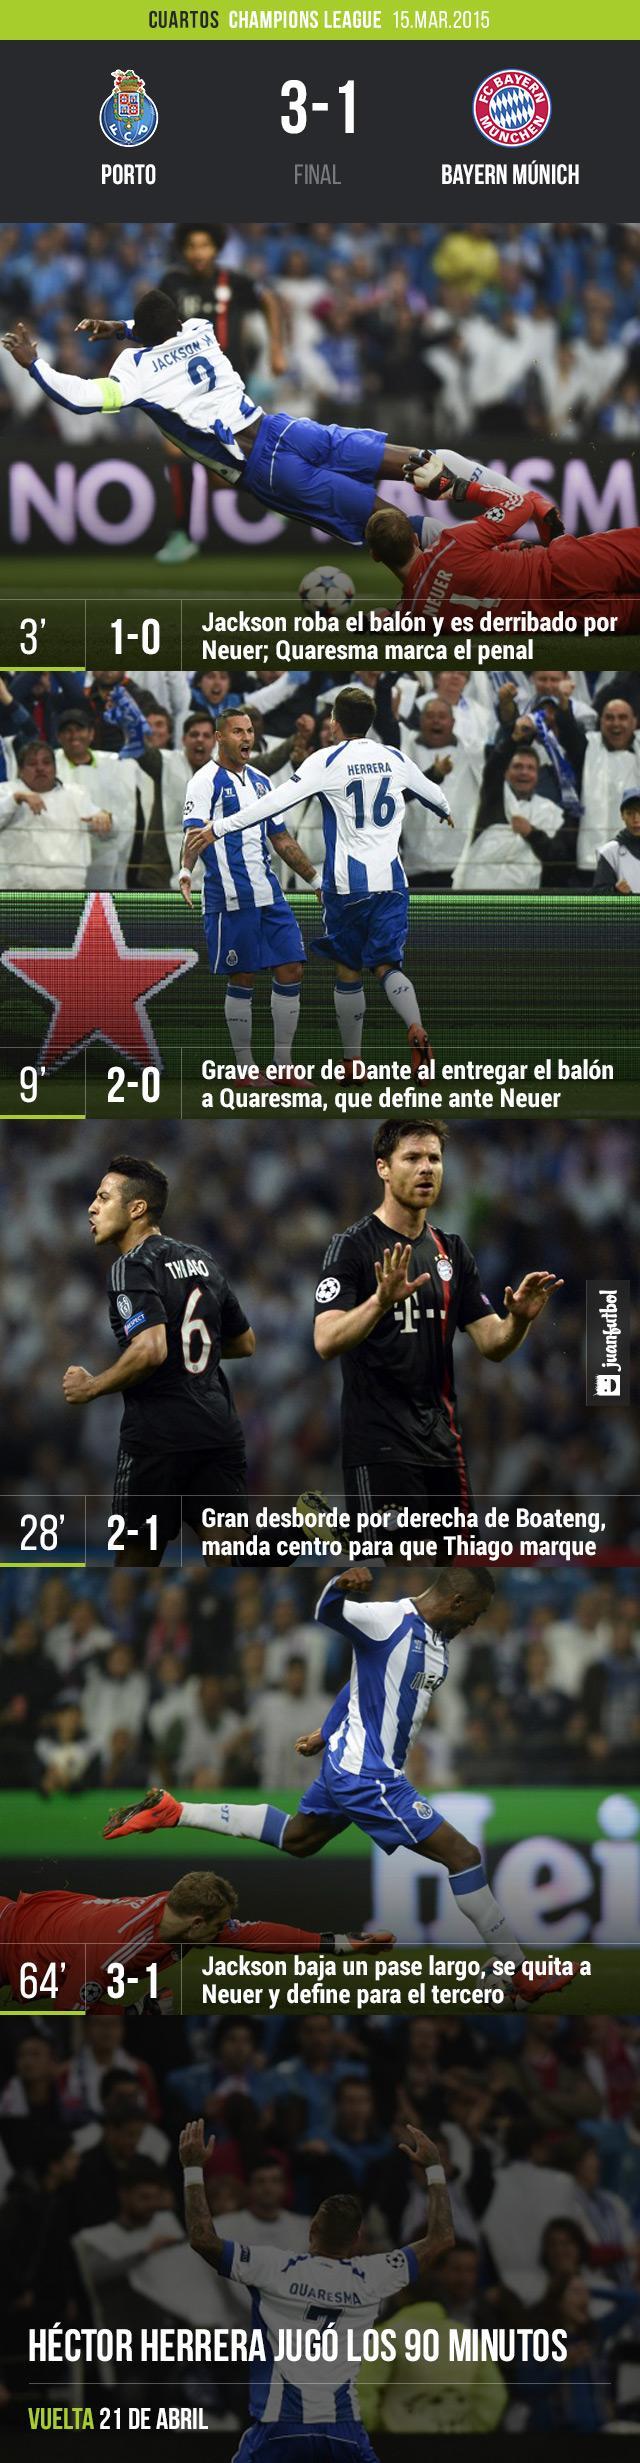 Porto derrota 3-1 a Bayern Múnich con dos goles de Quaresma y Jackson Martínez